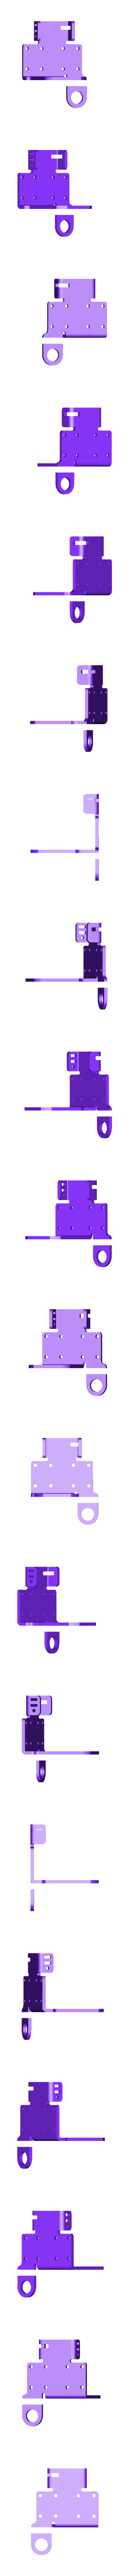 cDqxWw0CmPl.stl Download free STL file 3D Printed Printrbot Metal Plus X Cart • 3D printing model, rushmere3d